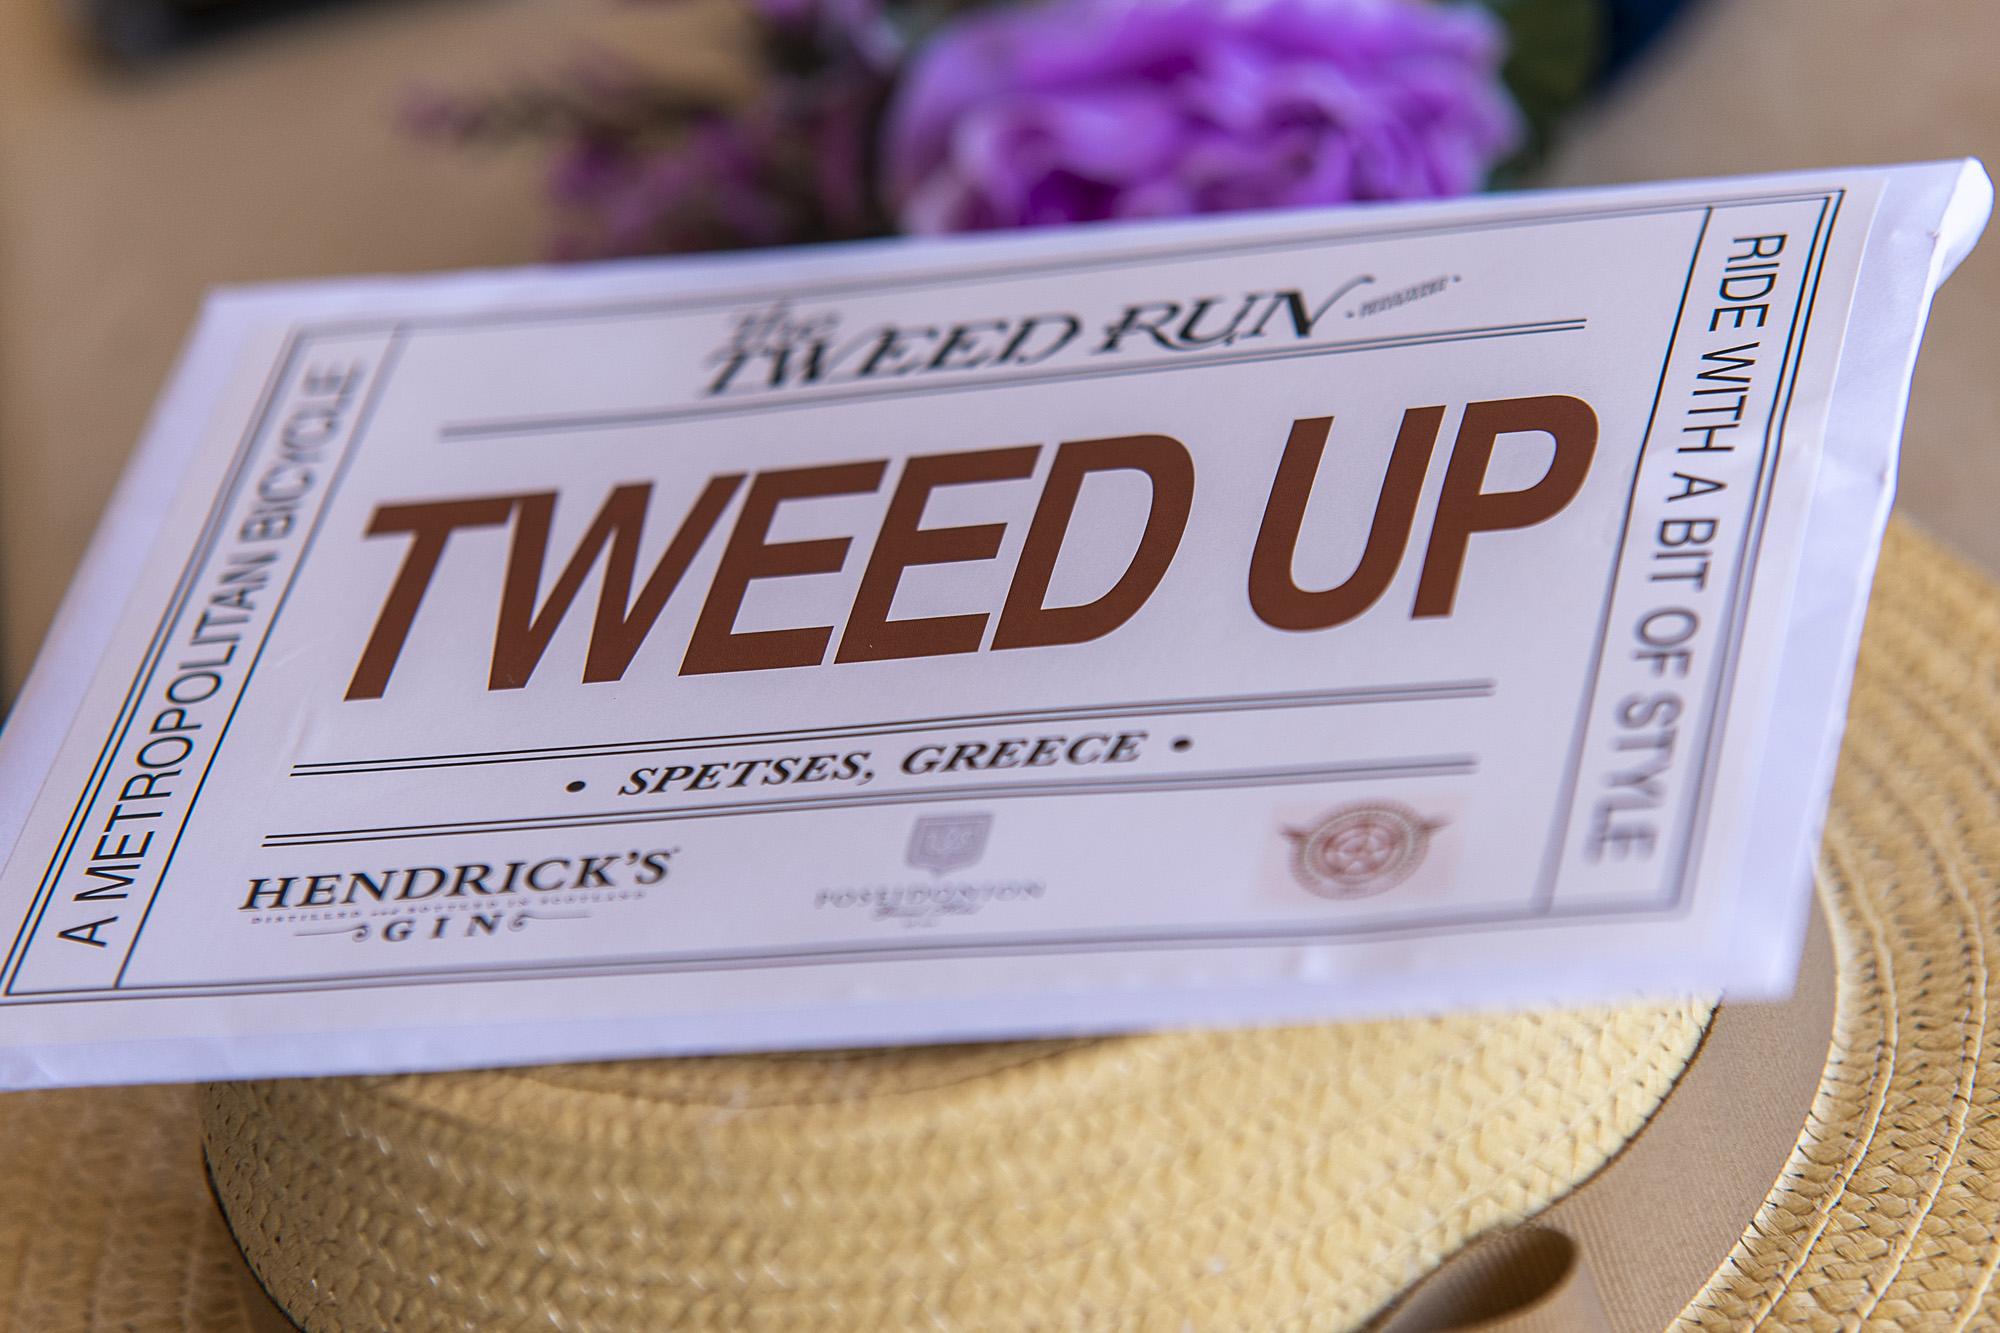 Amvyx Hendrick's Gin sponsors the 6th Tweed Run